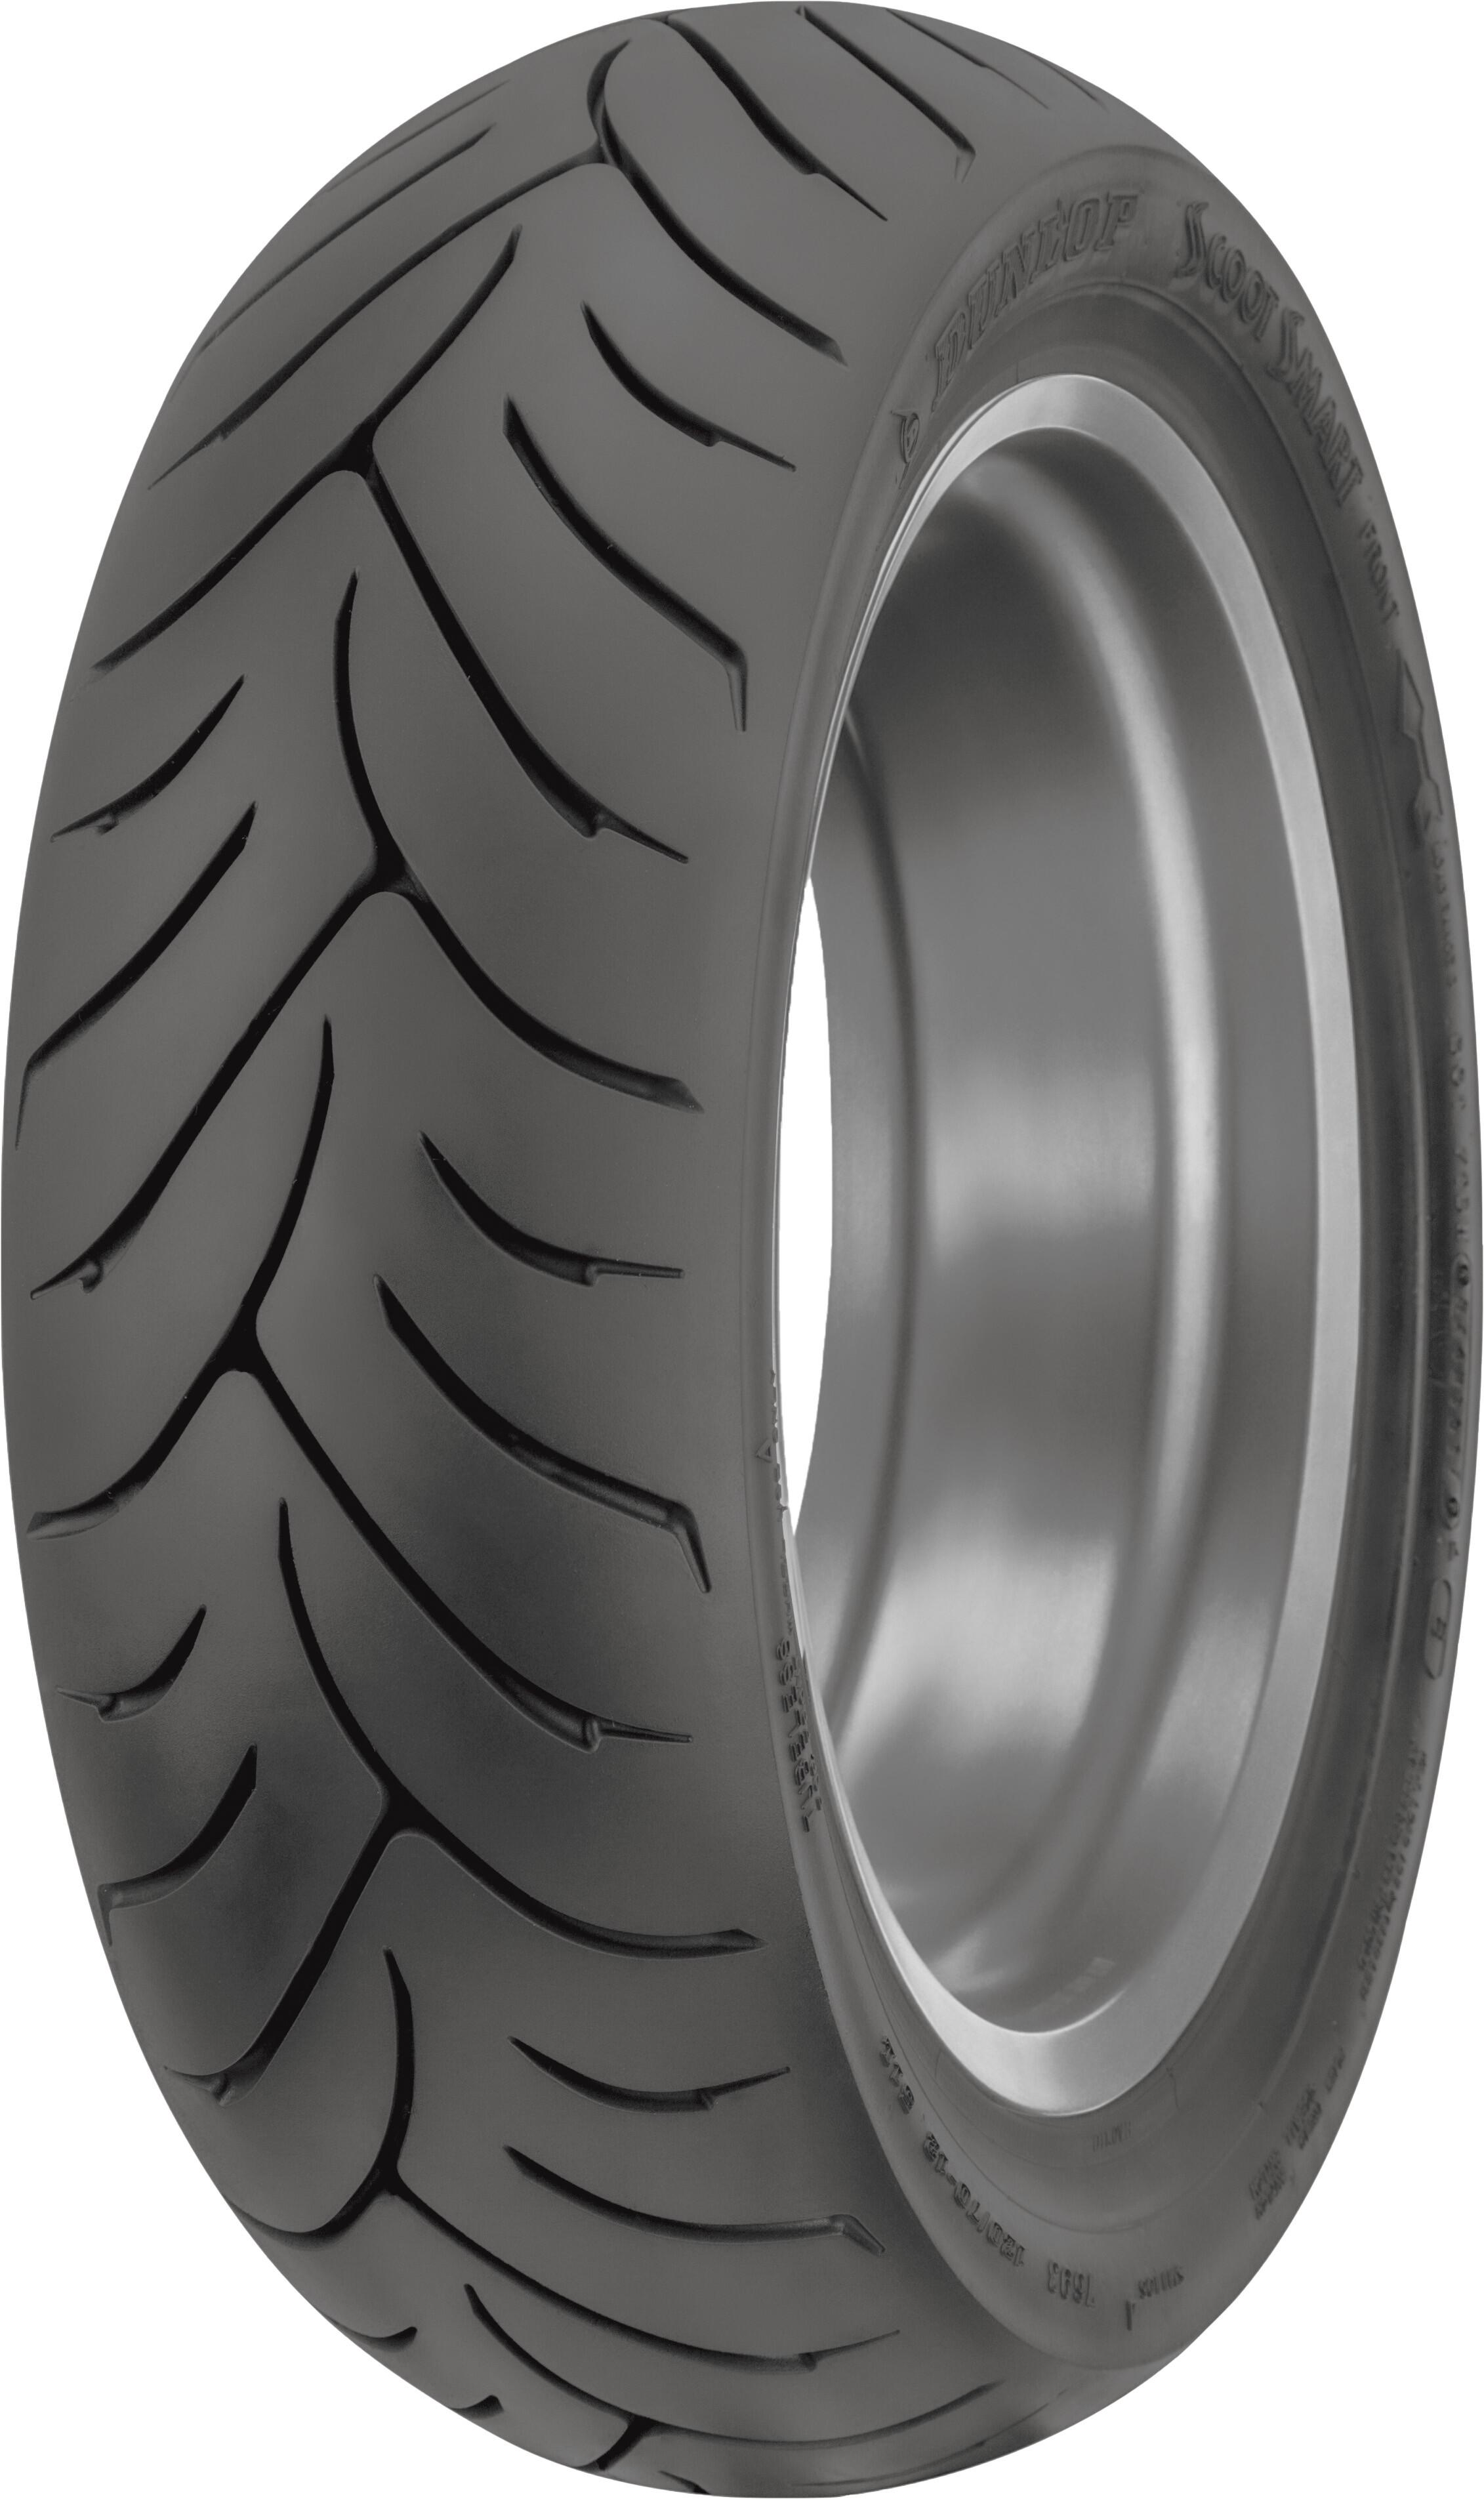 Scootsmart Tires